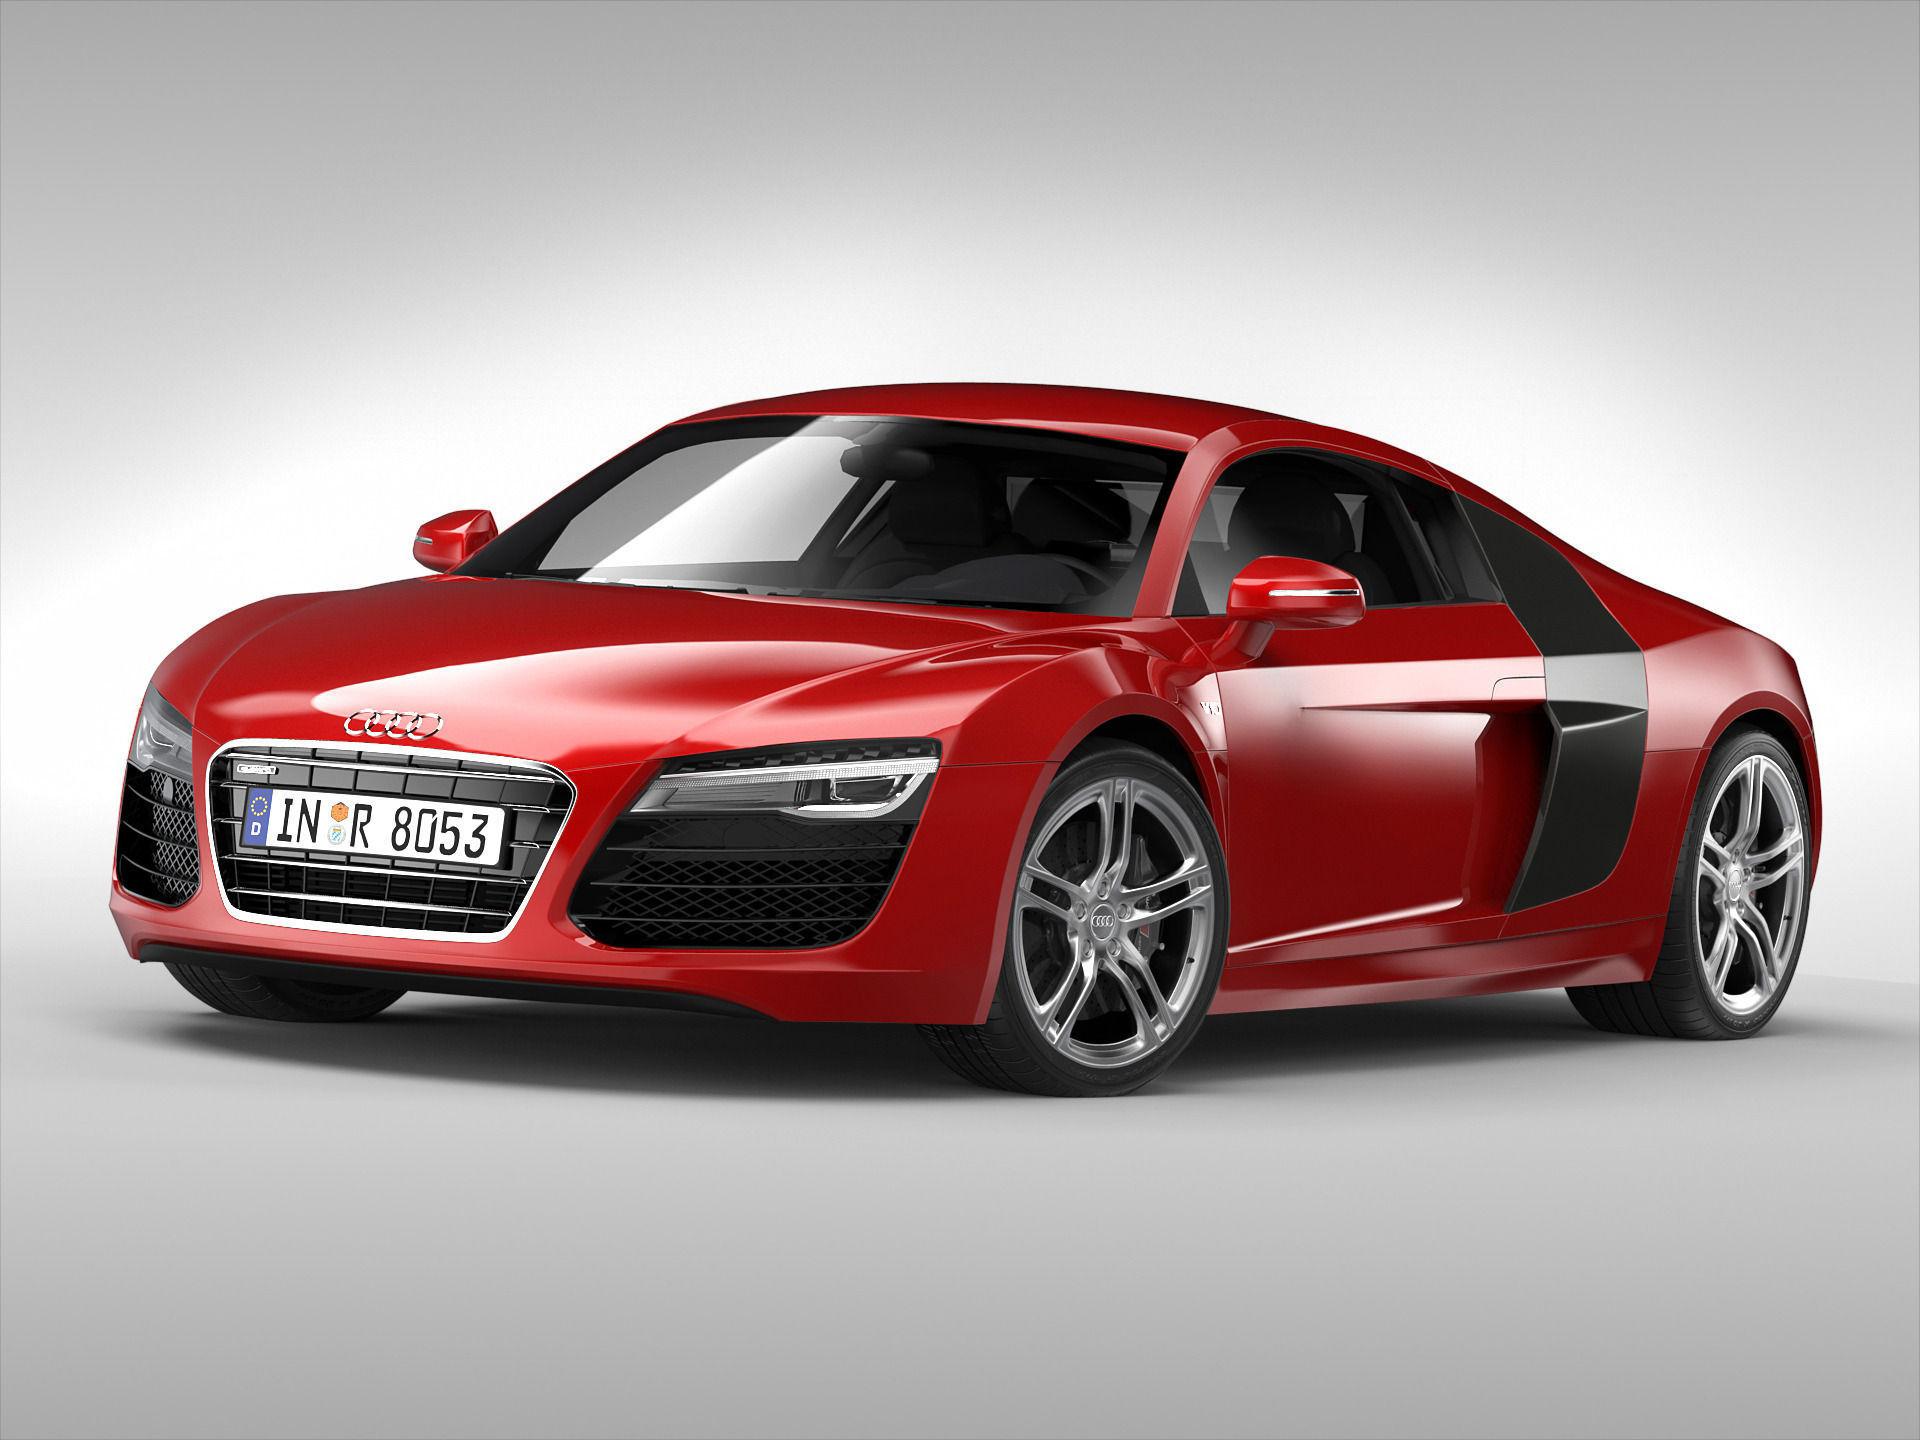 Audi R8 V10 Coupe 2013